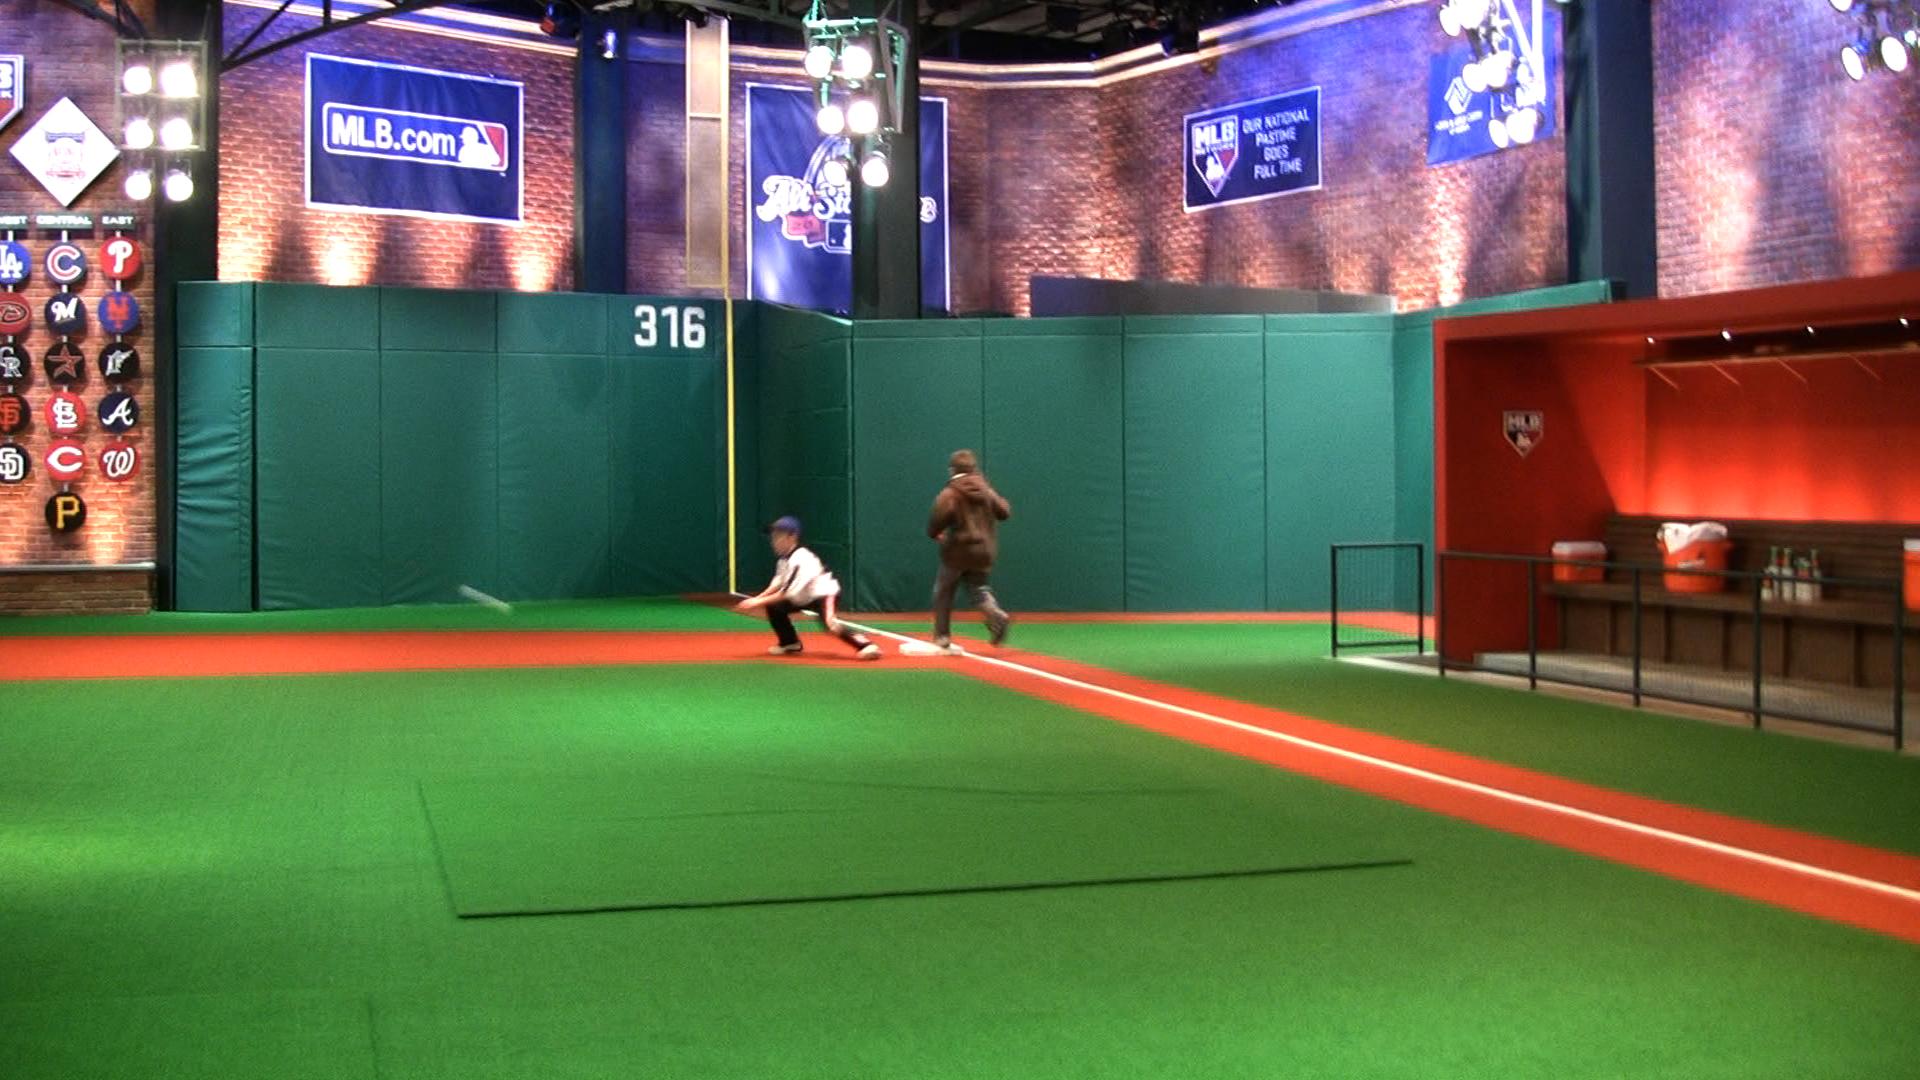 Kids at MLB Network 22.jpg